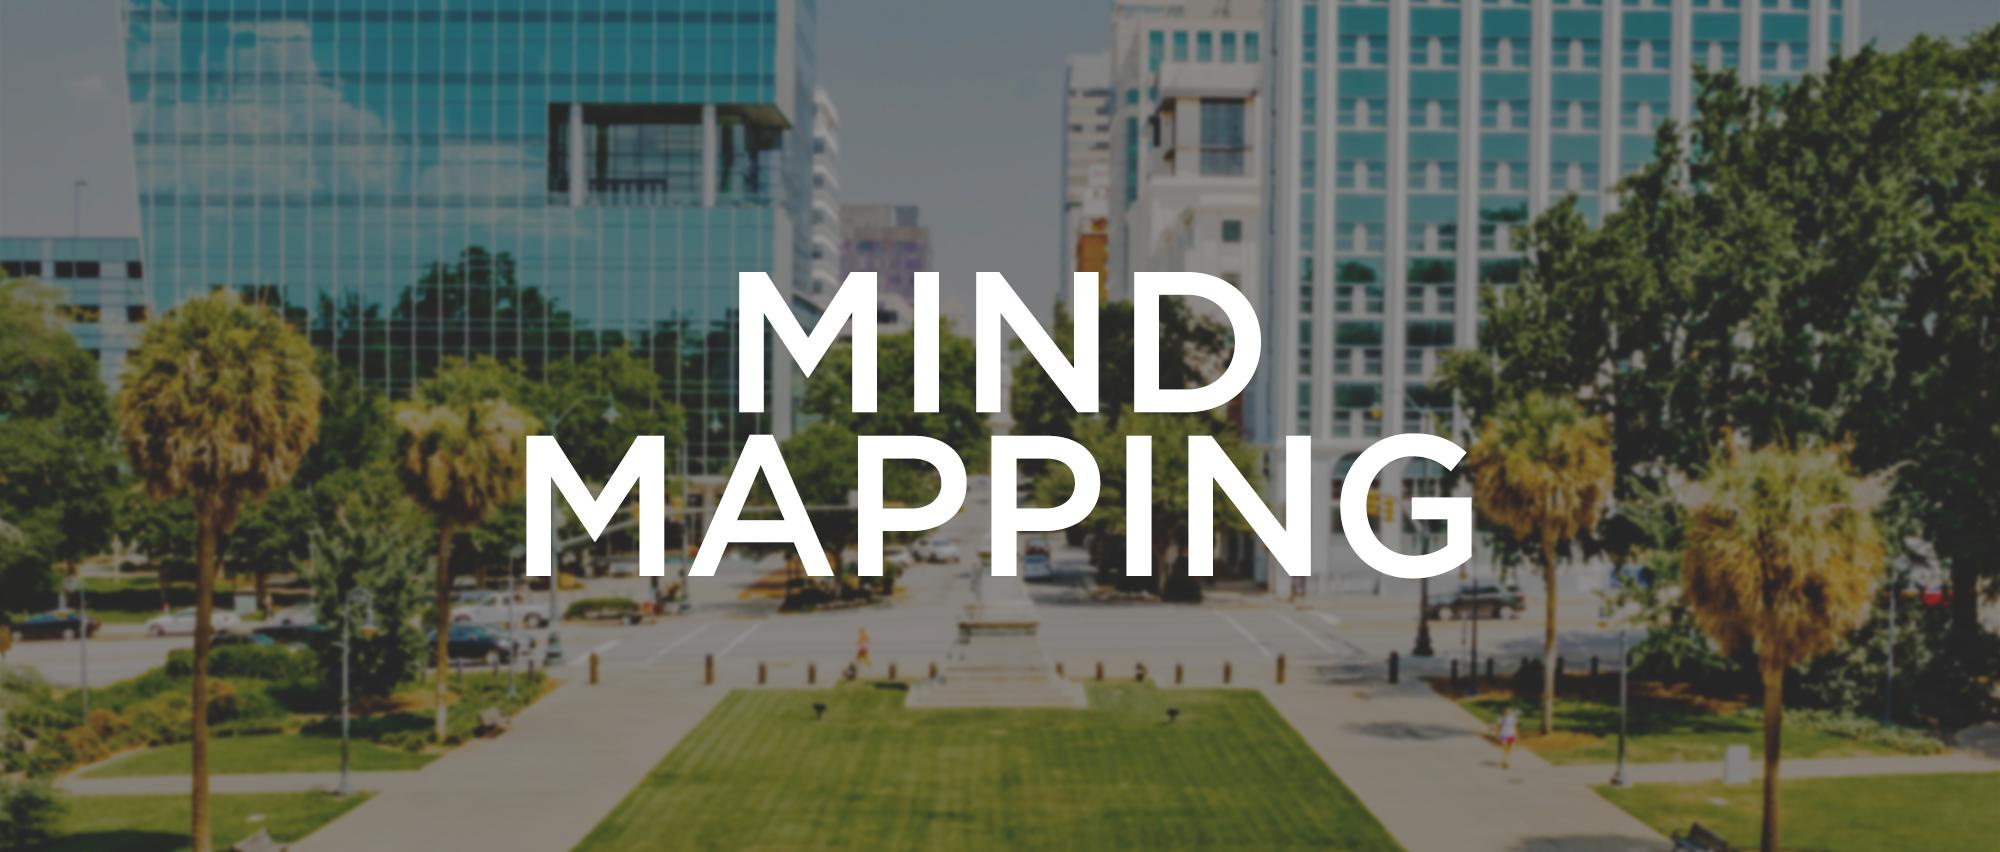 mindmapping.png